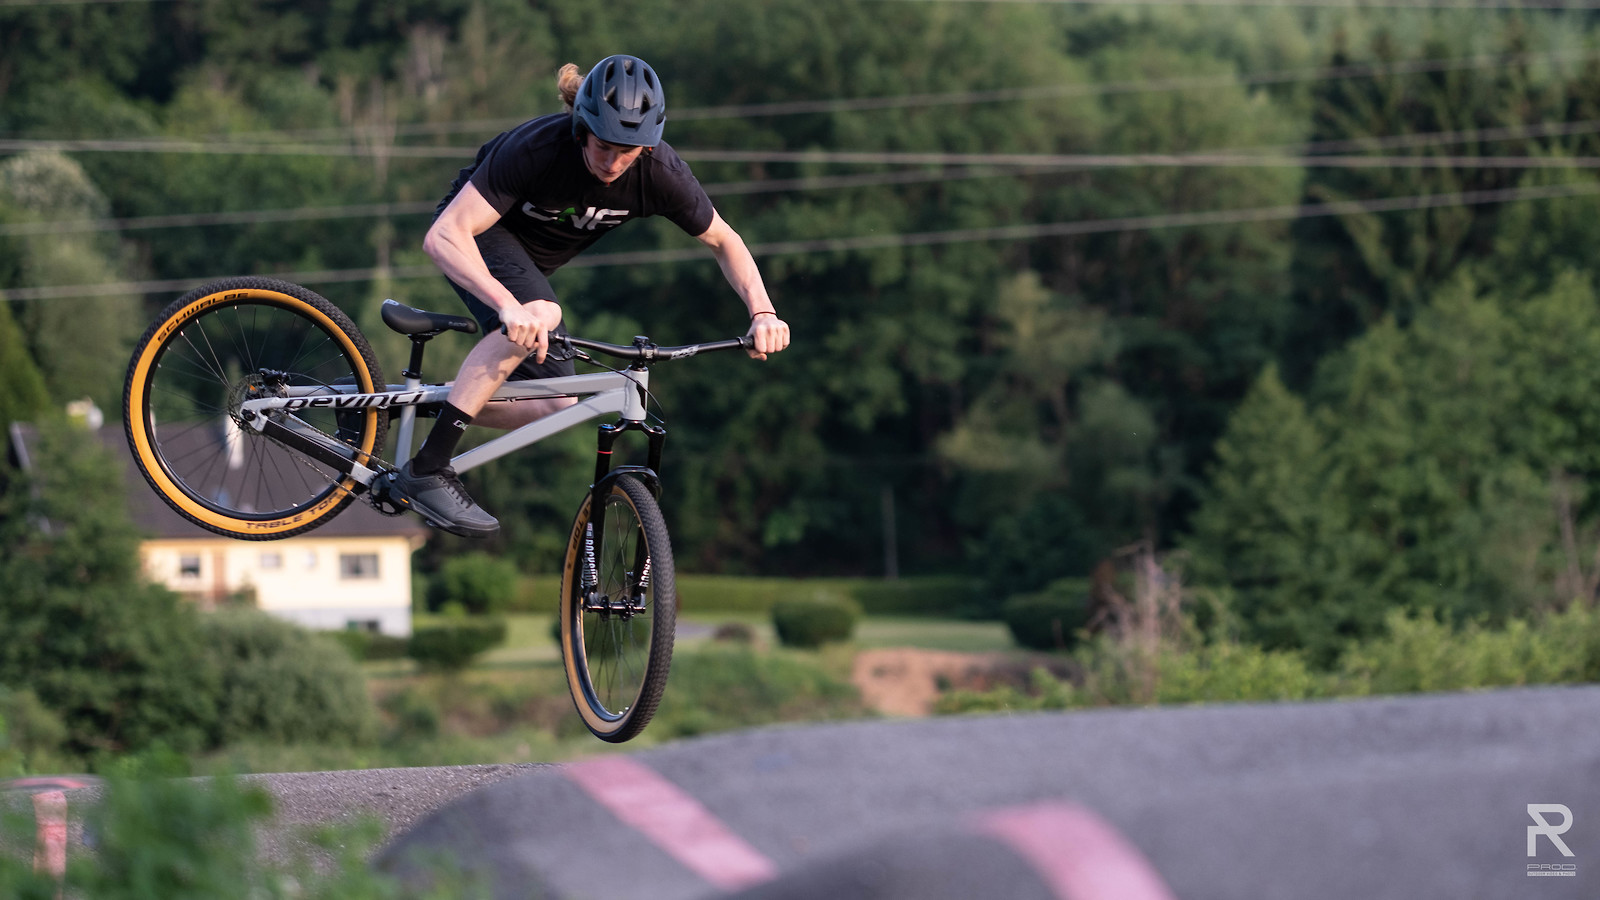 DSCF7250 - Lucas_Bruder - Mountain Biking Pictures - Vital MTB